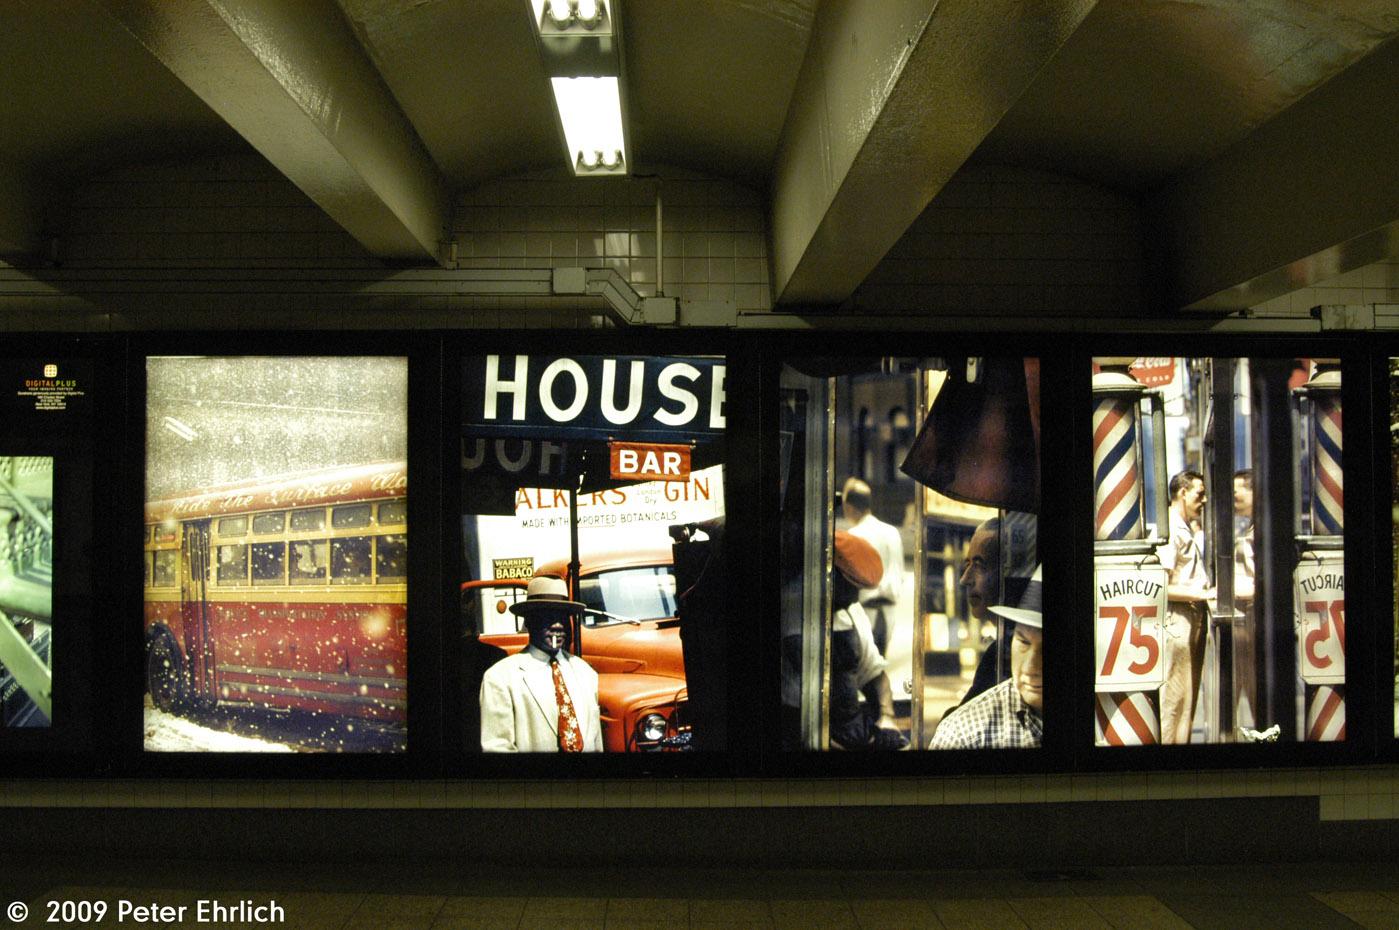 (329k, 1399x930)<br><b>Country:</b> United States<br><b>City:</b> New York<br><b>System:</b> New York City Transit<br><b>Line:</b> IND 6th Avenue Line<br><b>Location:</b> 42nd Street/Bryant Park <br><b>Photo by:</b> Peter Ehrlich<br><b>Date:</b> 7/22/2009<br><b>Artwork:</b> <i>Underground Exposure: Photographs from a Daily Commute</i>, Travis Ruse (2009).<br><b>Viewed (this week/total):</b> 4 / 1152